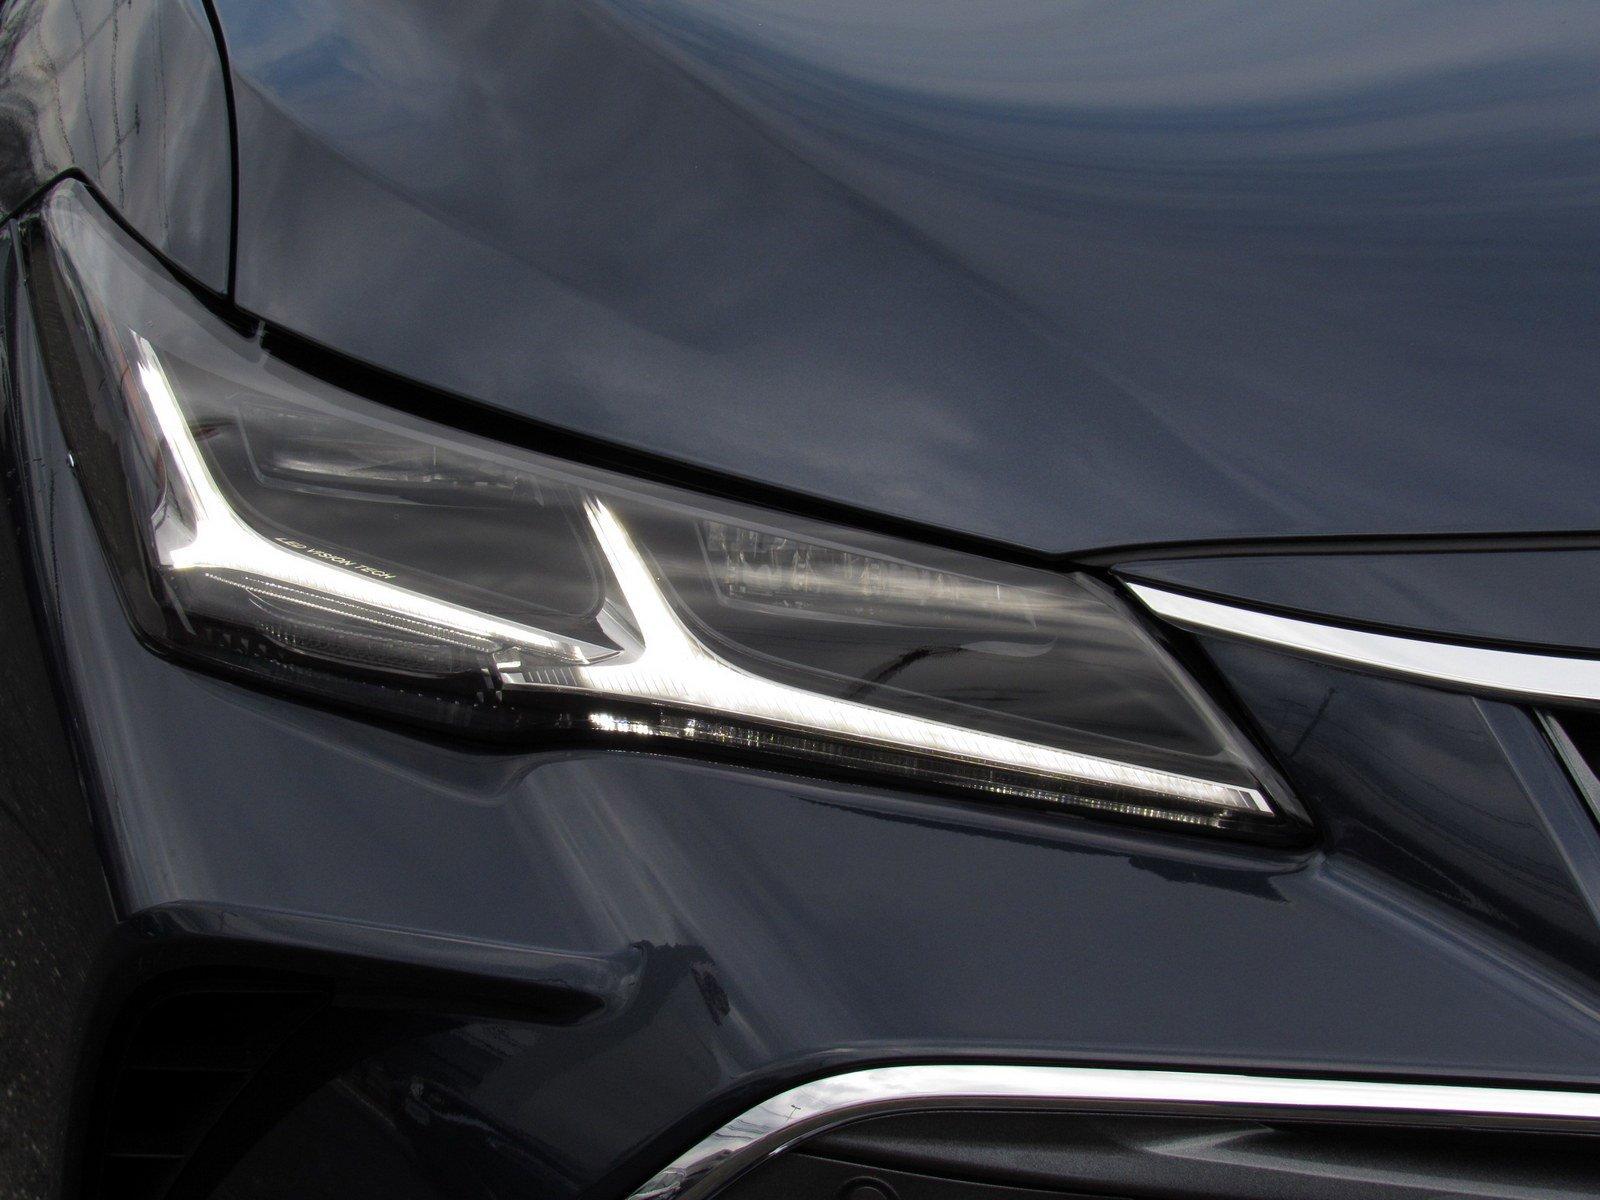 New 2020 Toyota Avalon Limited